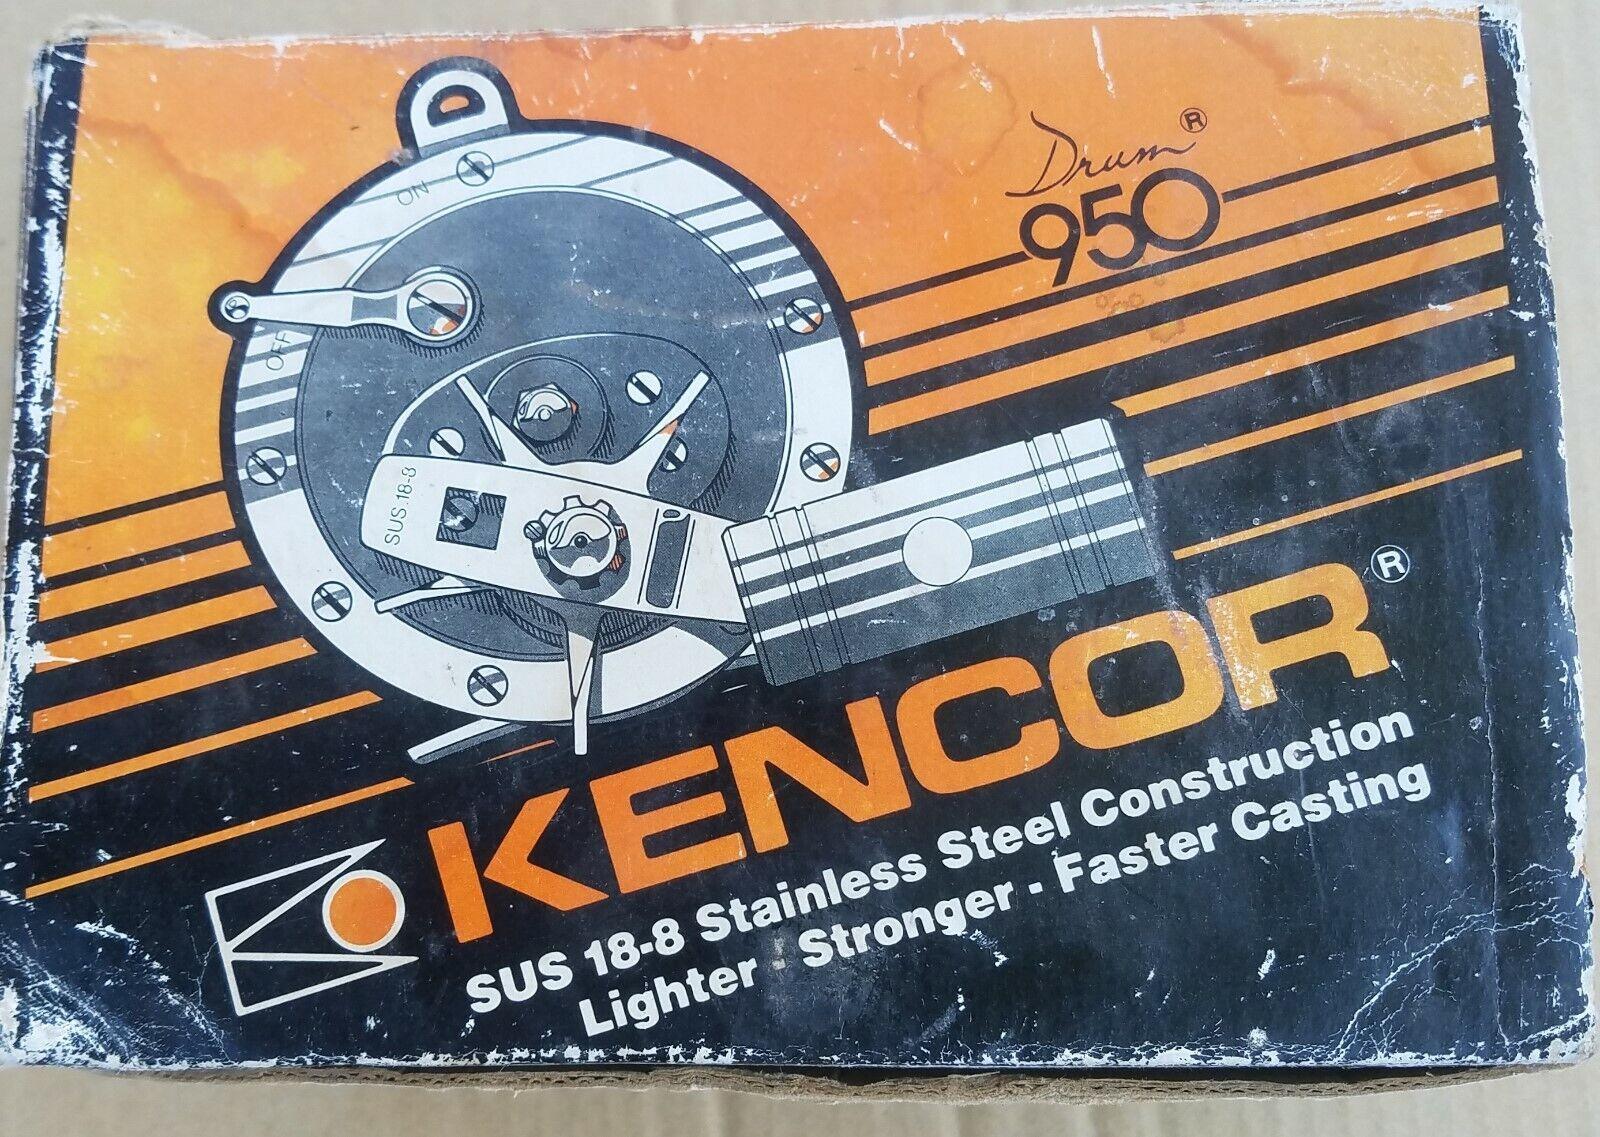 KENCOR NO. 950 DRUM STAINLESS DEEP SEA SALTWATER REEL Wscatola